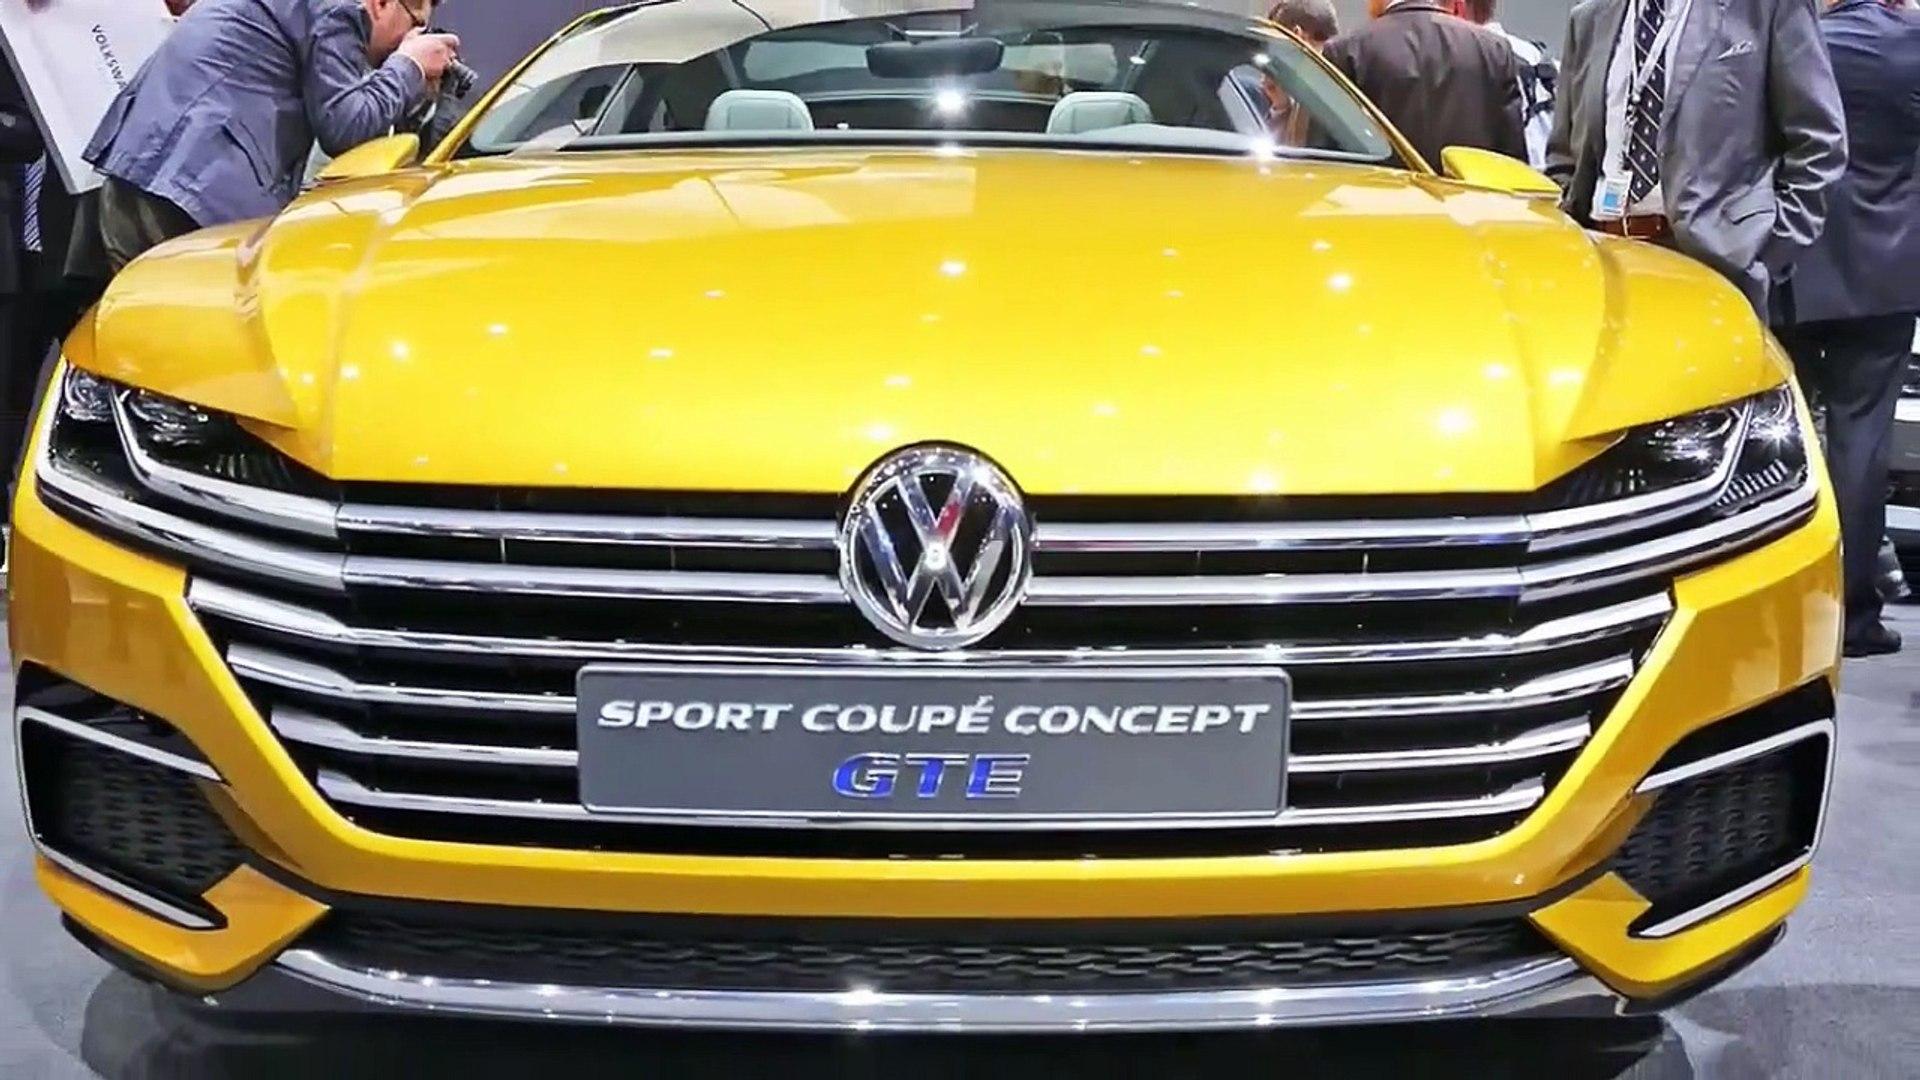 Best Sport Cars ~ Volkswagen Sport Coupe GTE